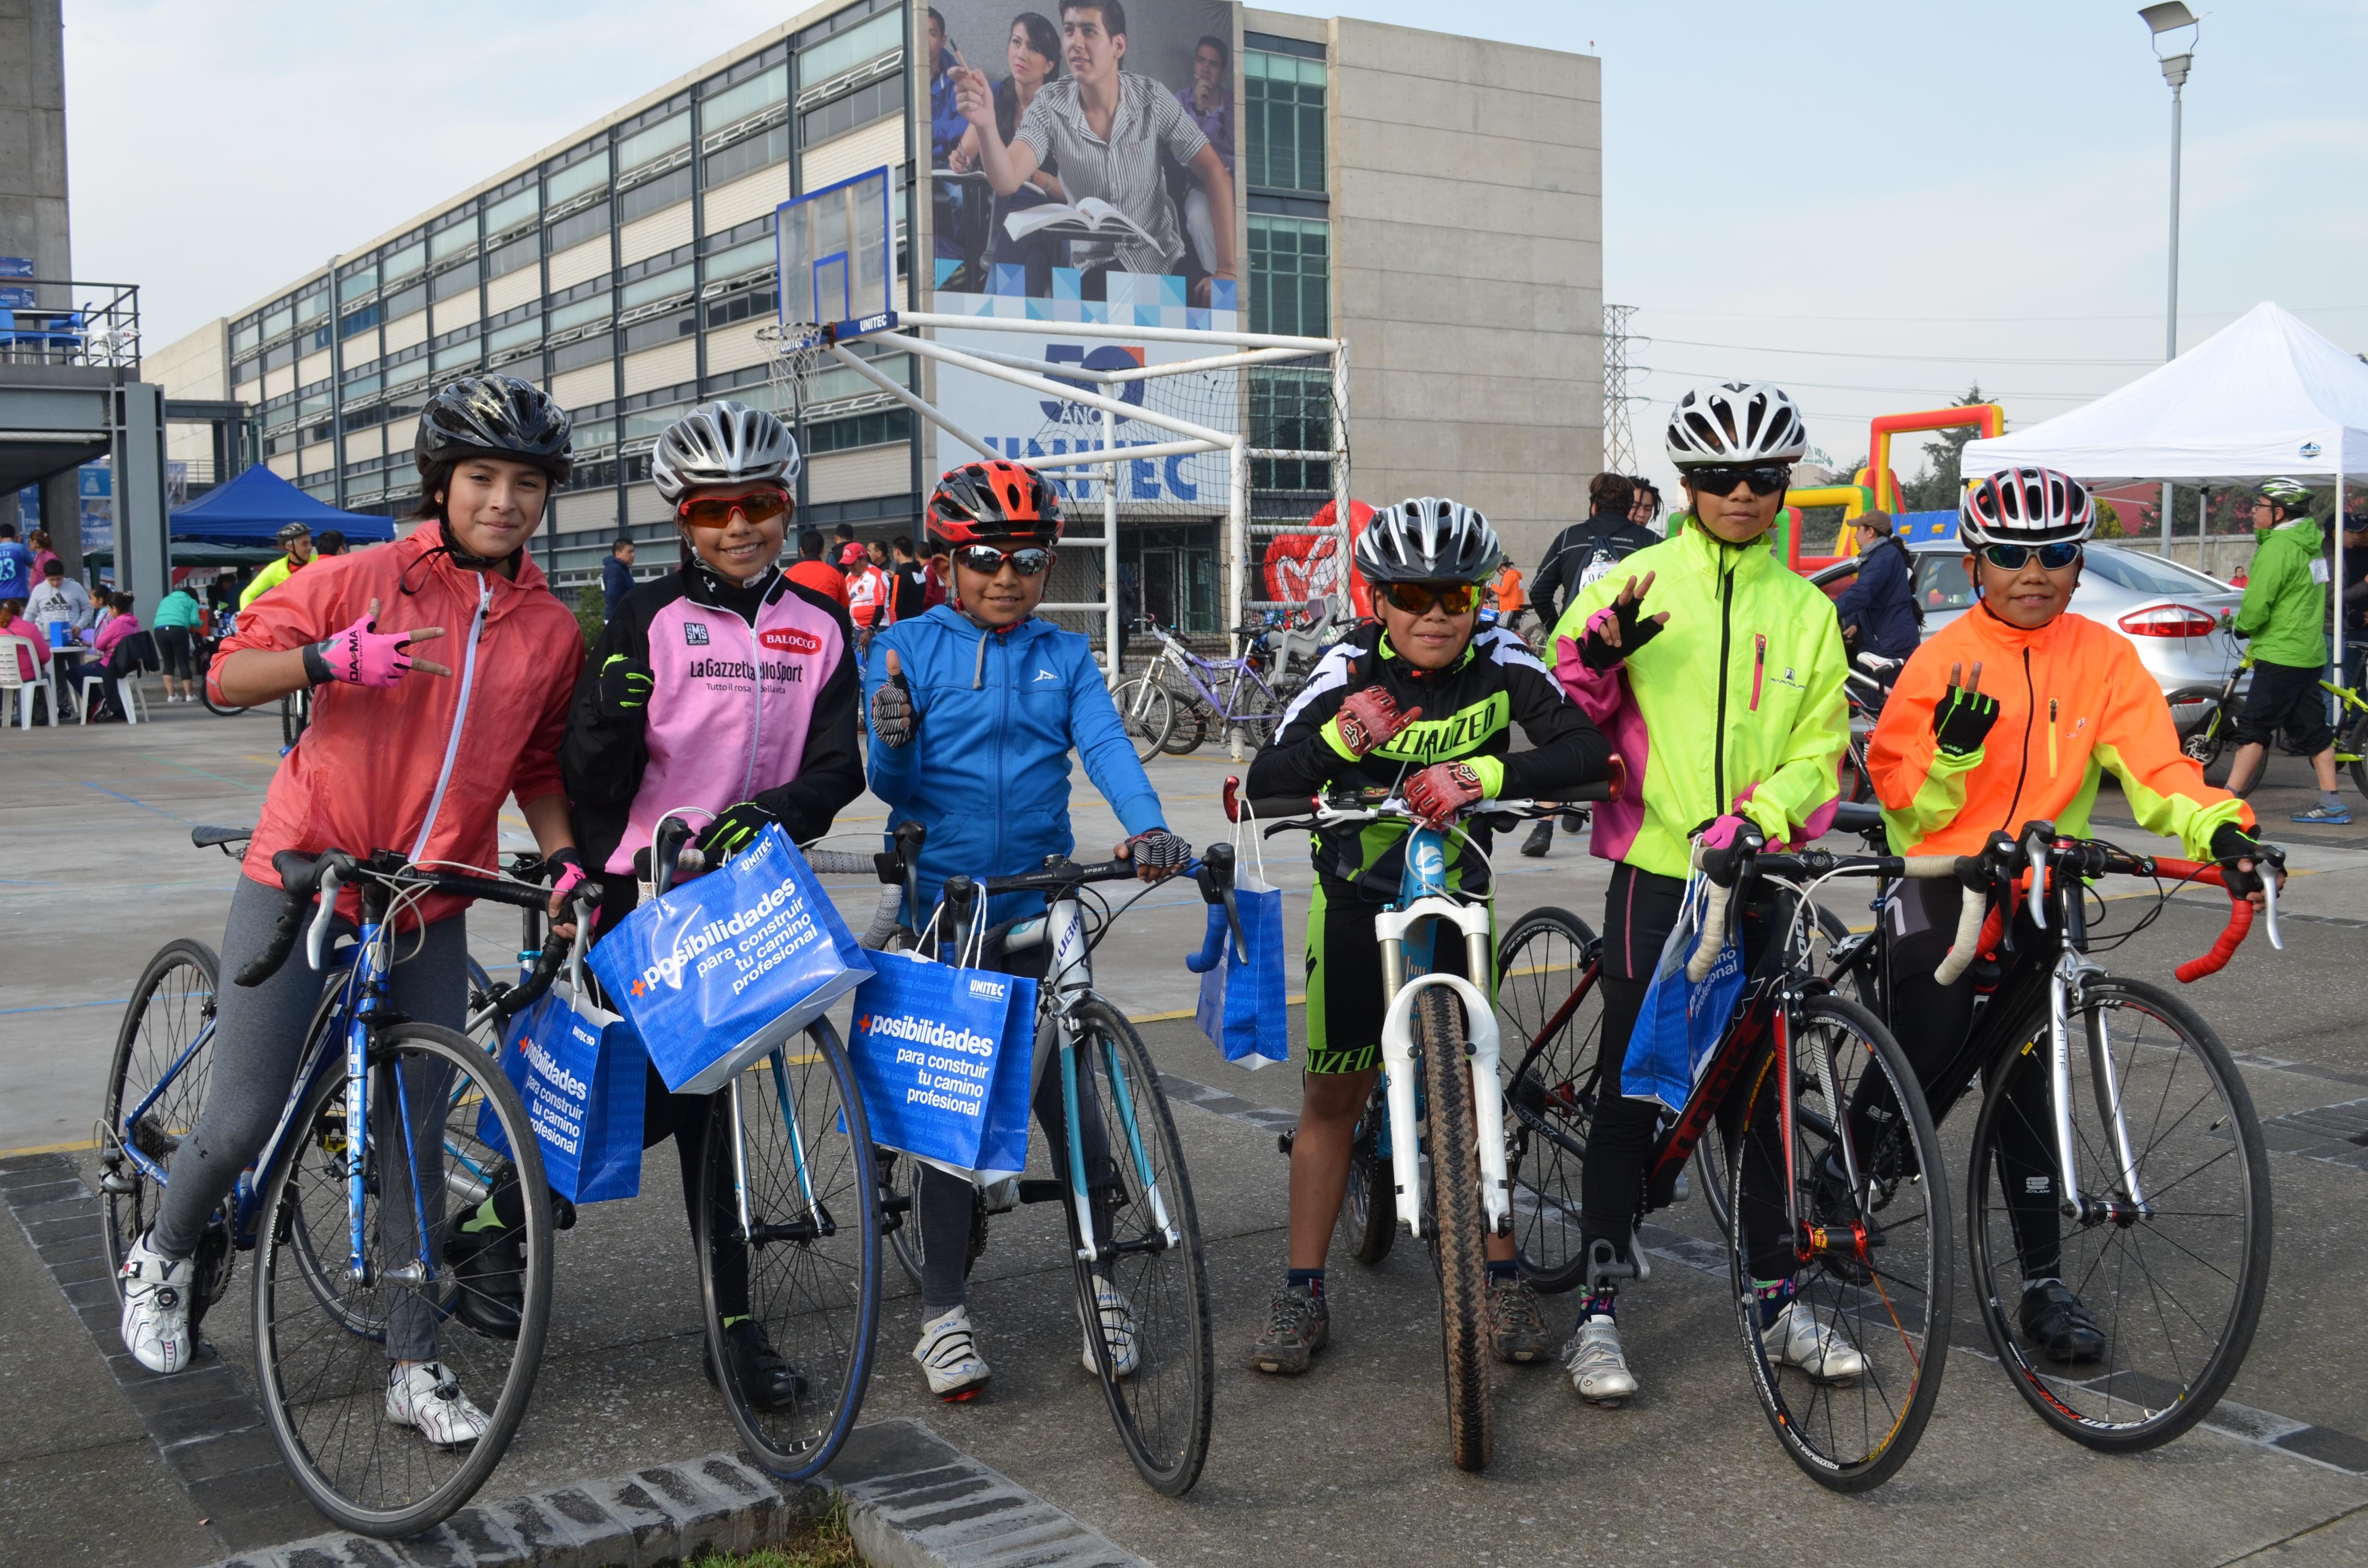 UNITEC Campus Toluca realiza su 3er Paseo Ciclista con éxito - Featured Image